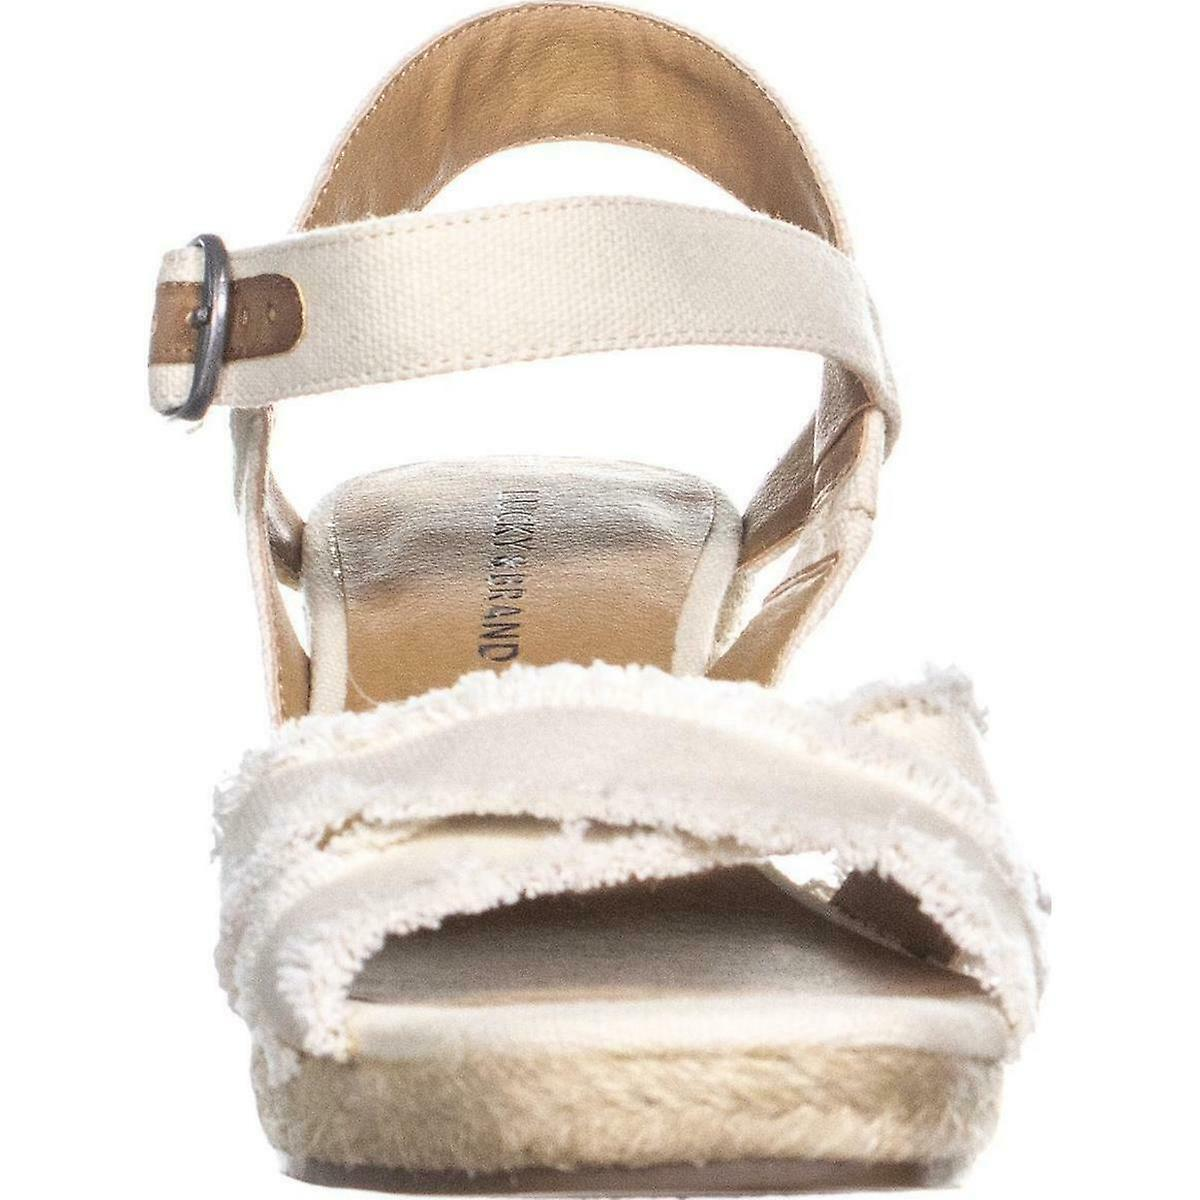 Lucky Brand Womens Maraline Fabric Open Toe Casual Platform Sandals